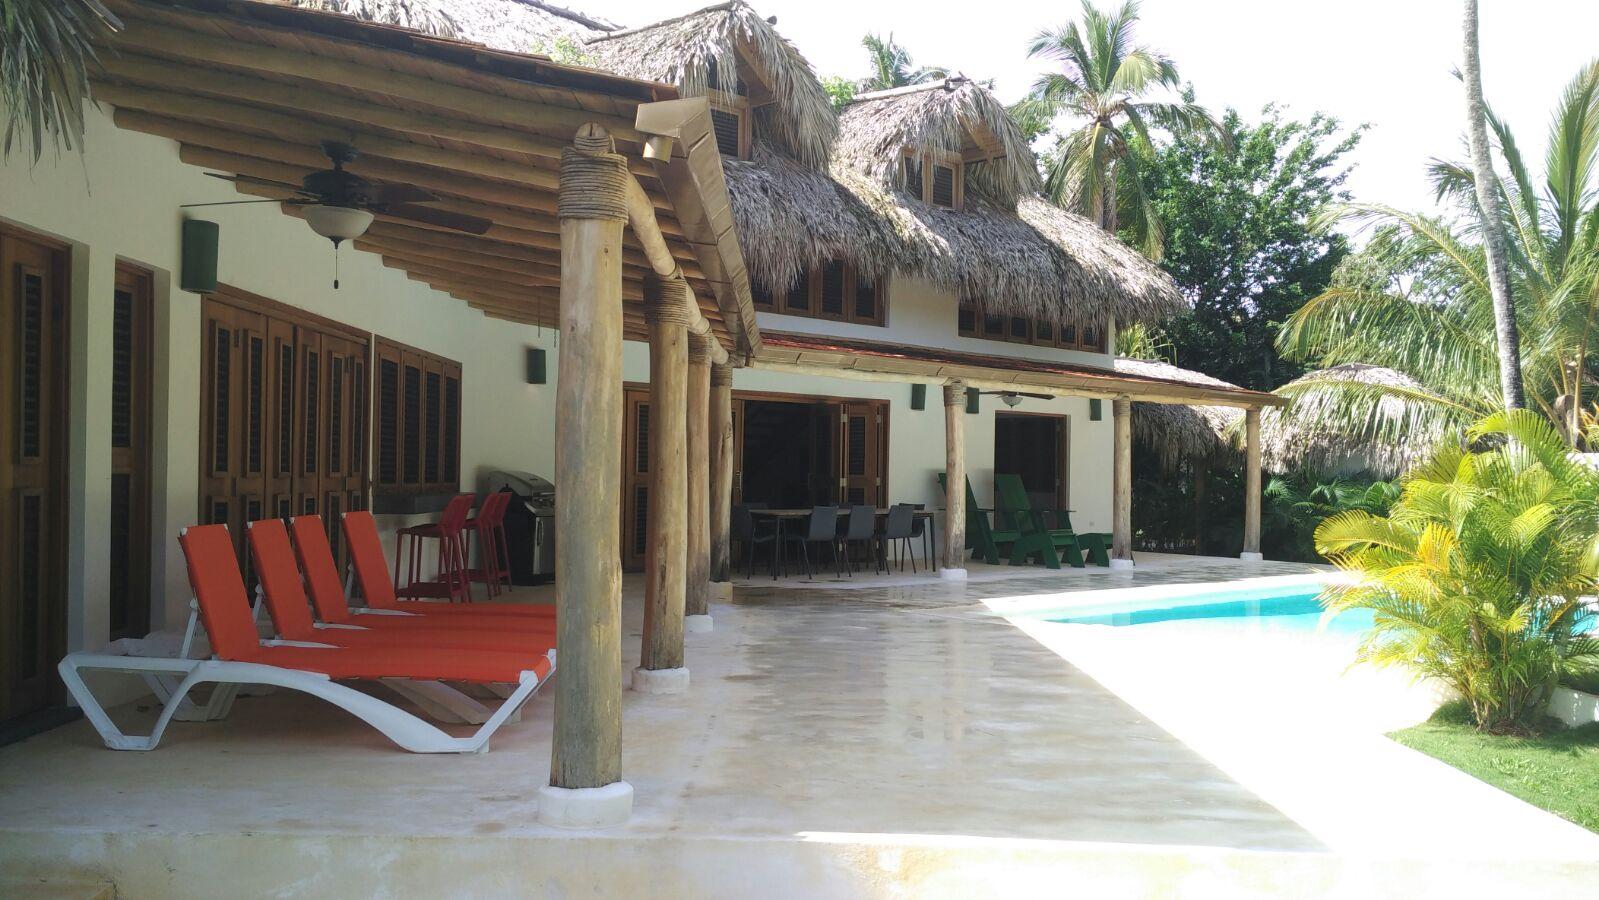 Villa for rent Las Terrenas Cote ci cote la2.jpeg